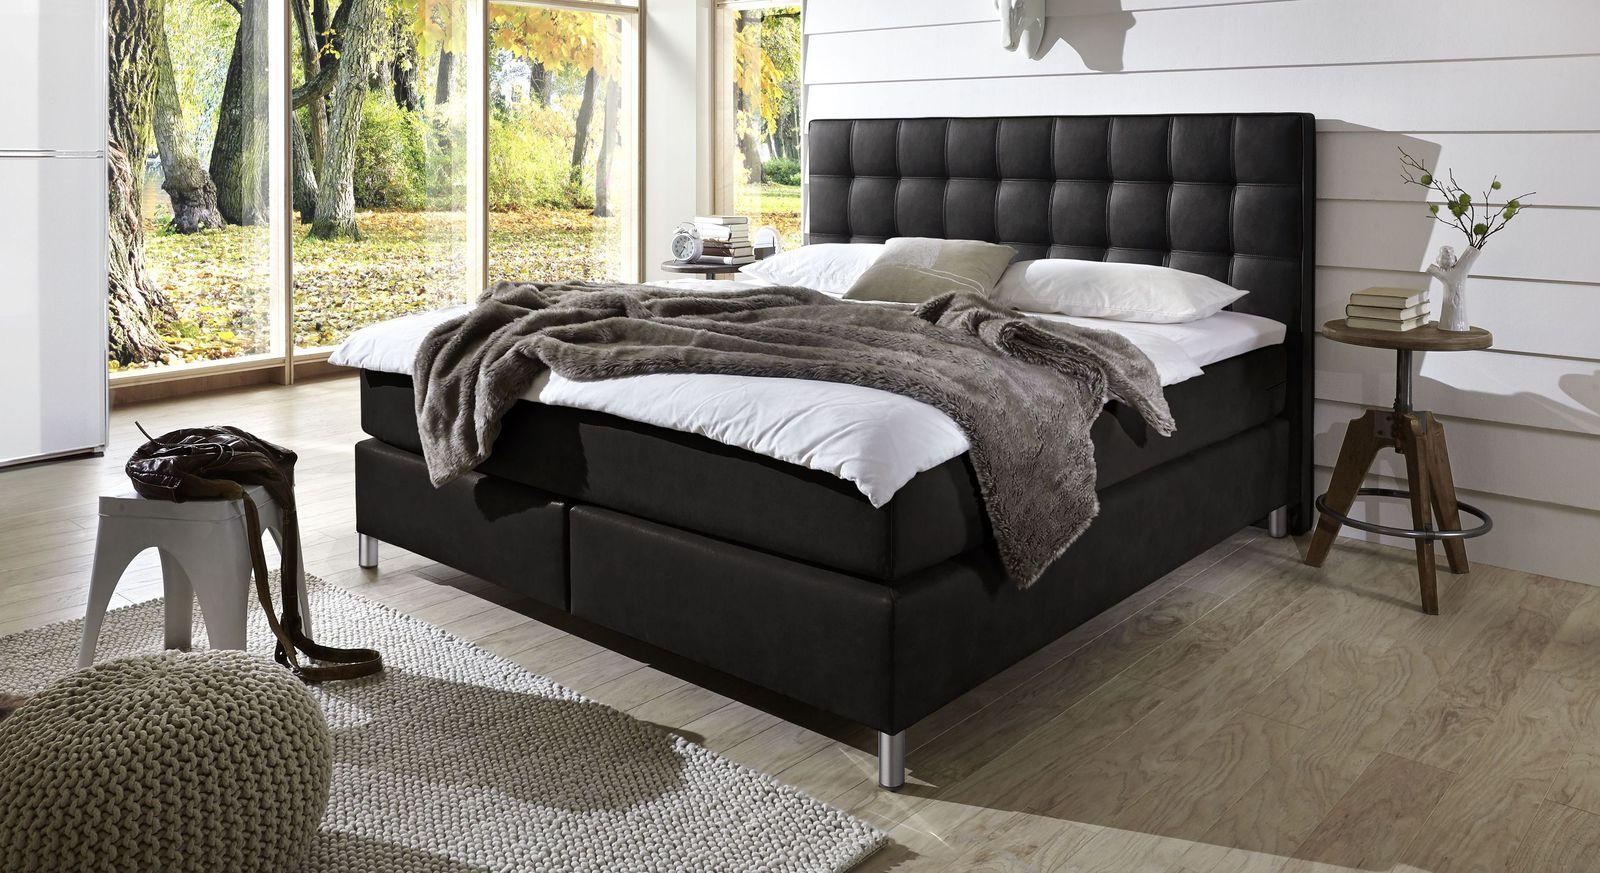 Boxspringbett Zamora aus elegantem Luxuskunstleder in Schwarz